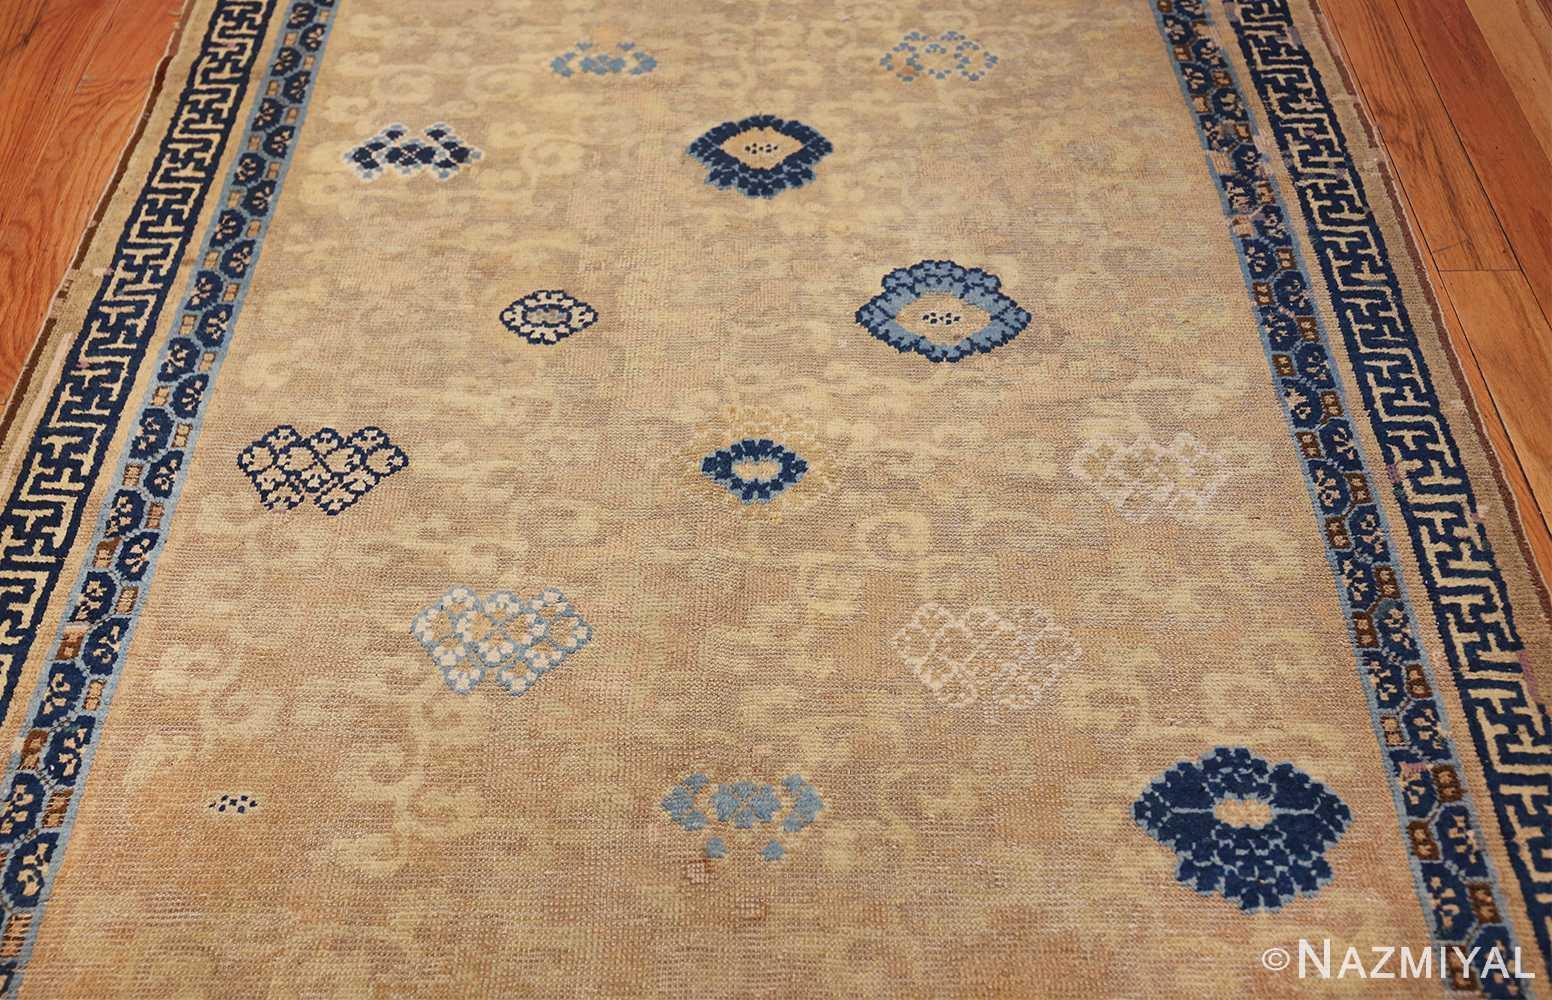 rare antique 17th century chinese ningsia rug 3285 field Nazmiyal